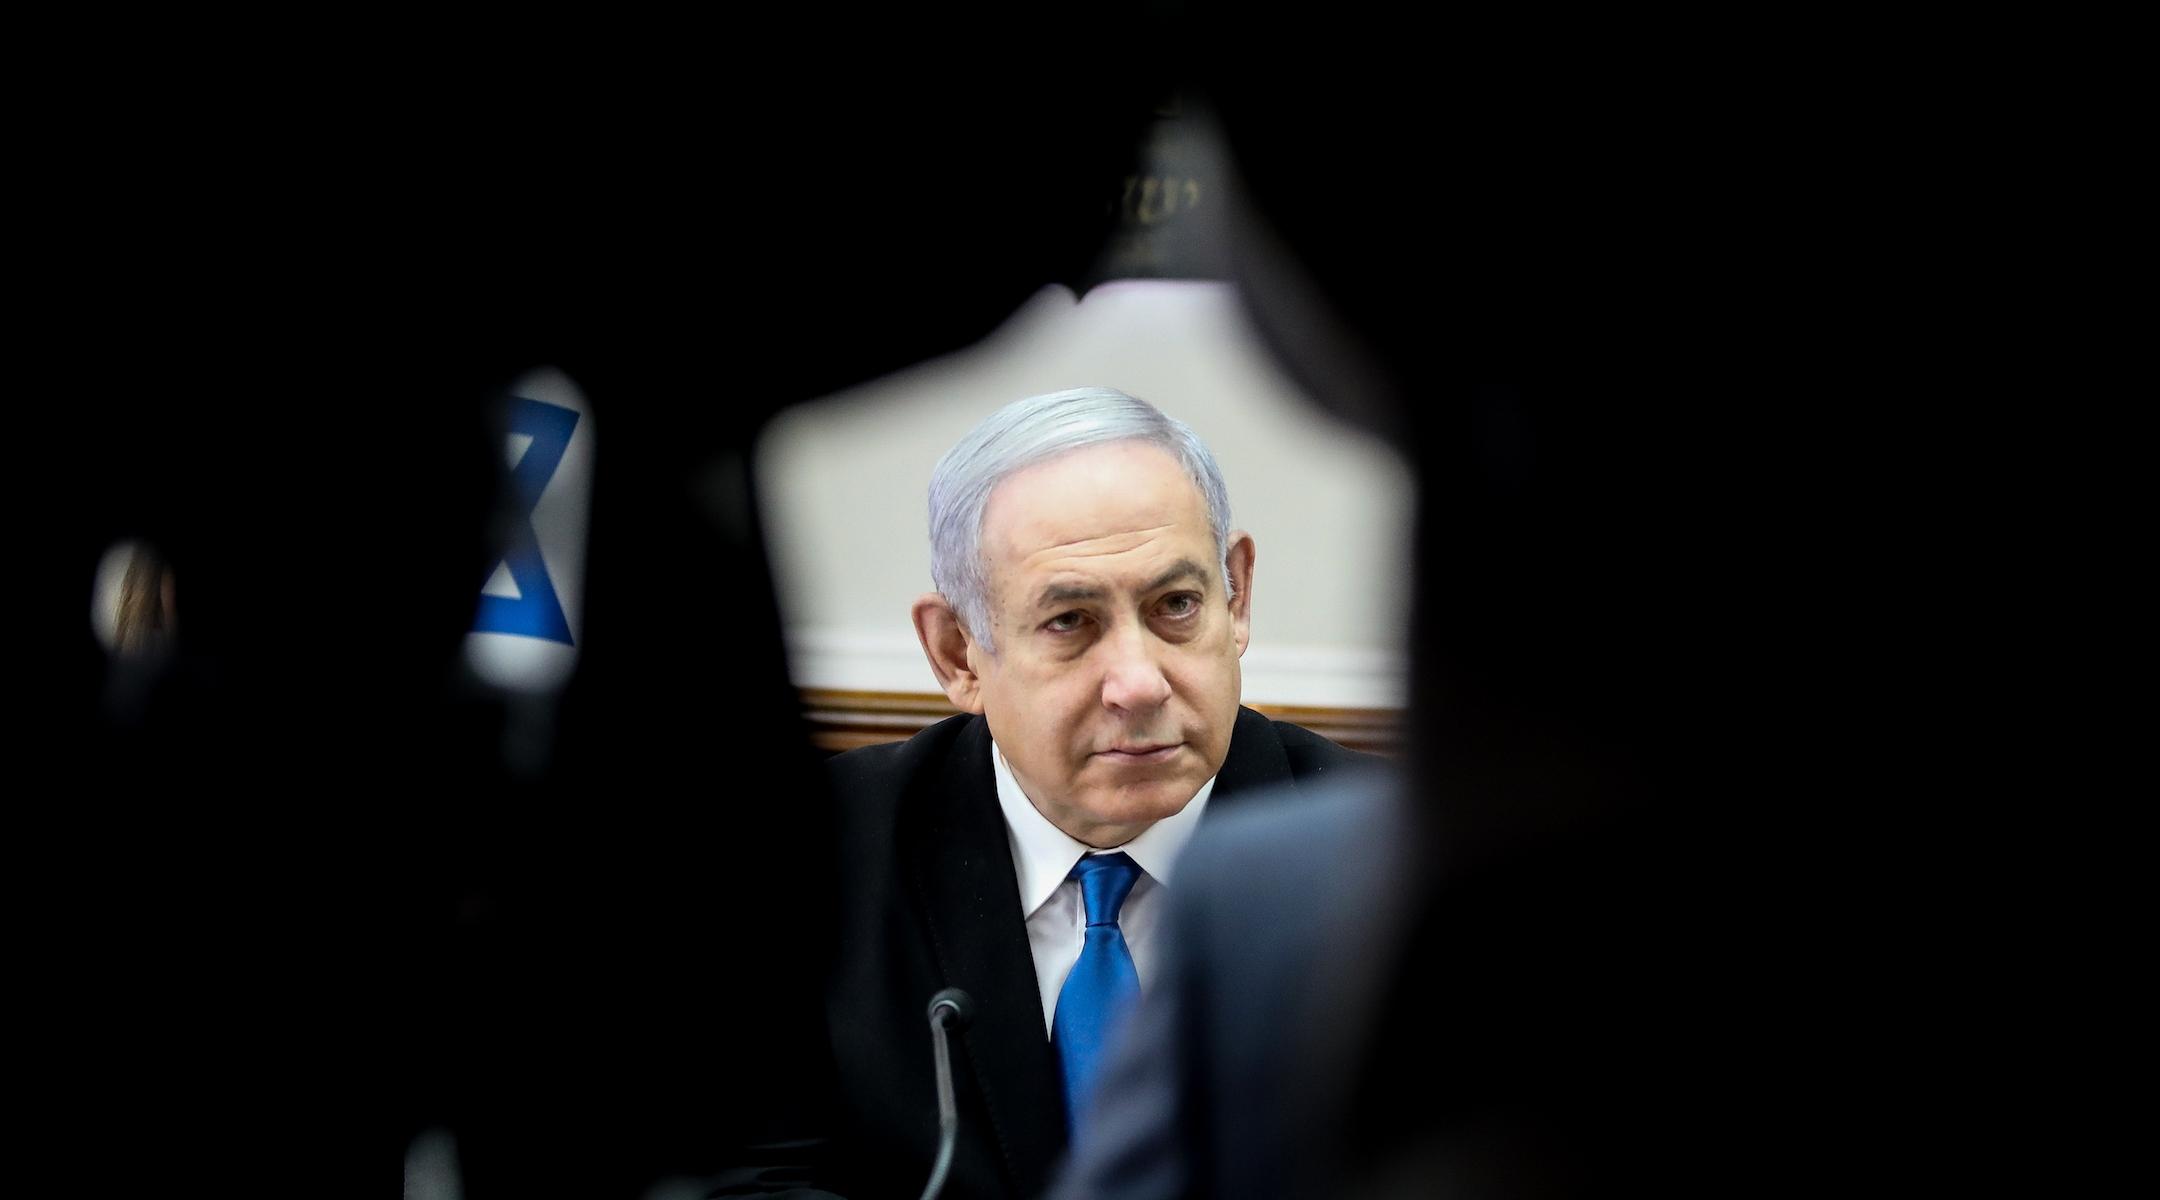 HBO is developing a series called 'Bibi' about Benjamin Netanyahu